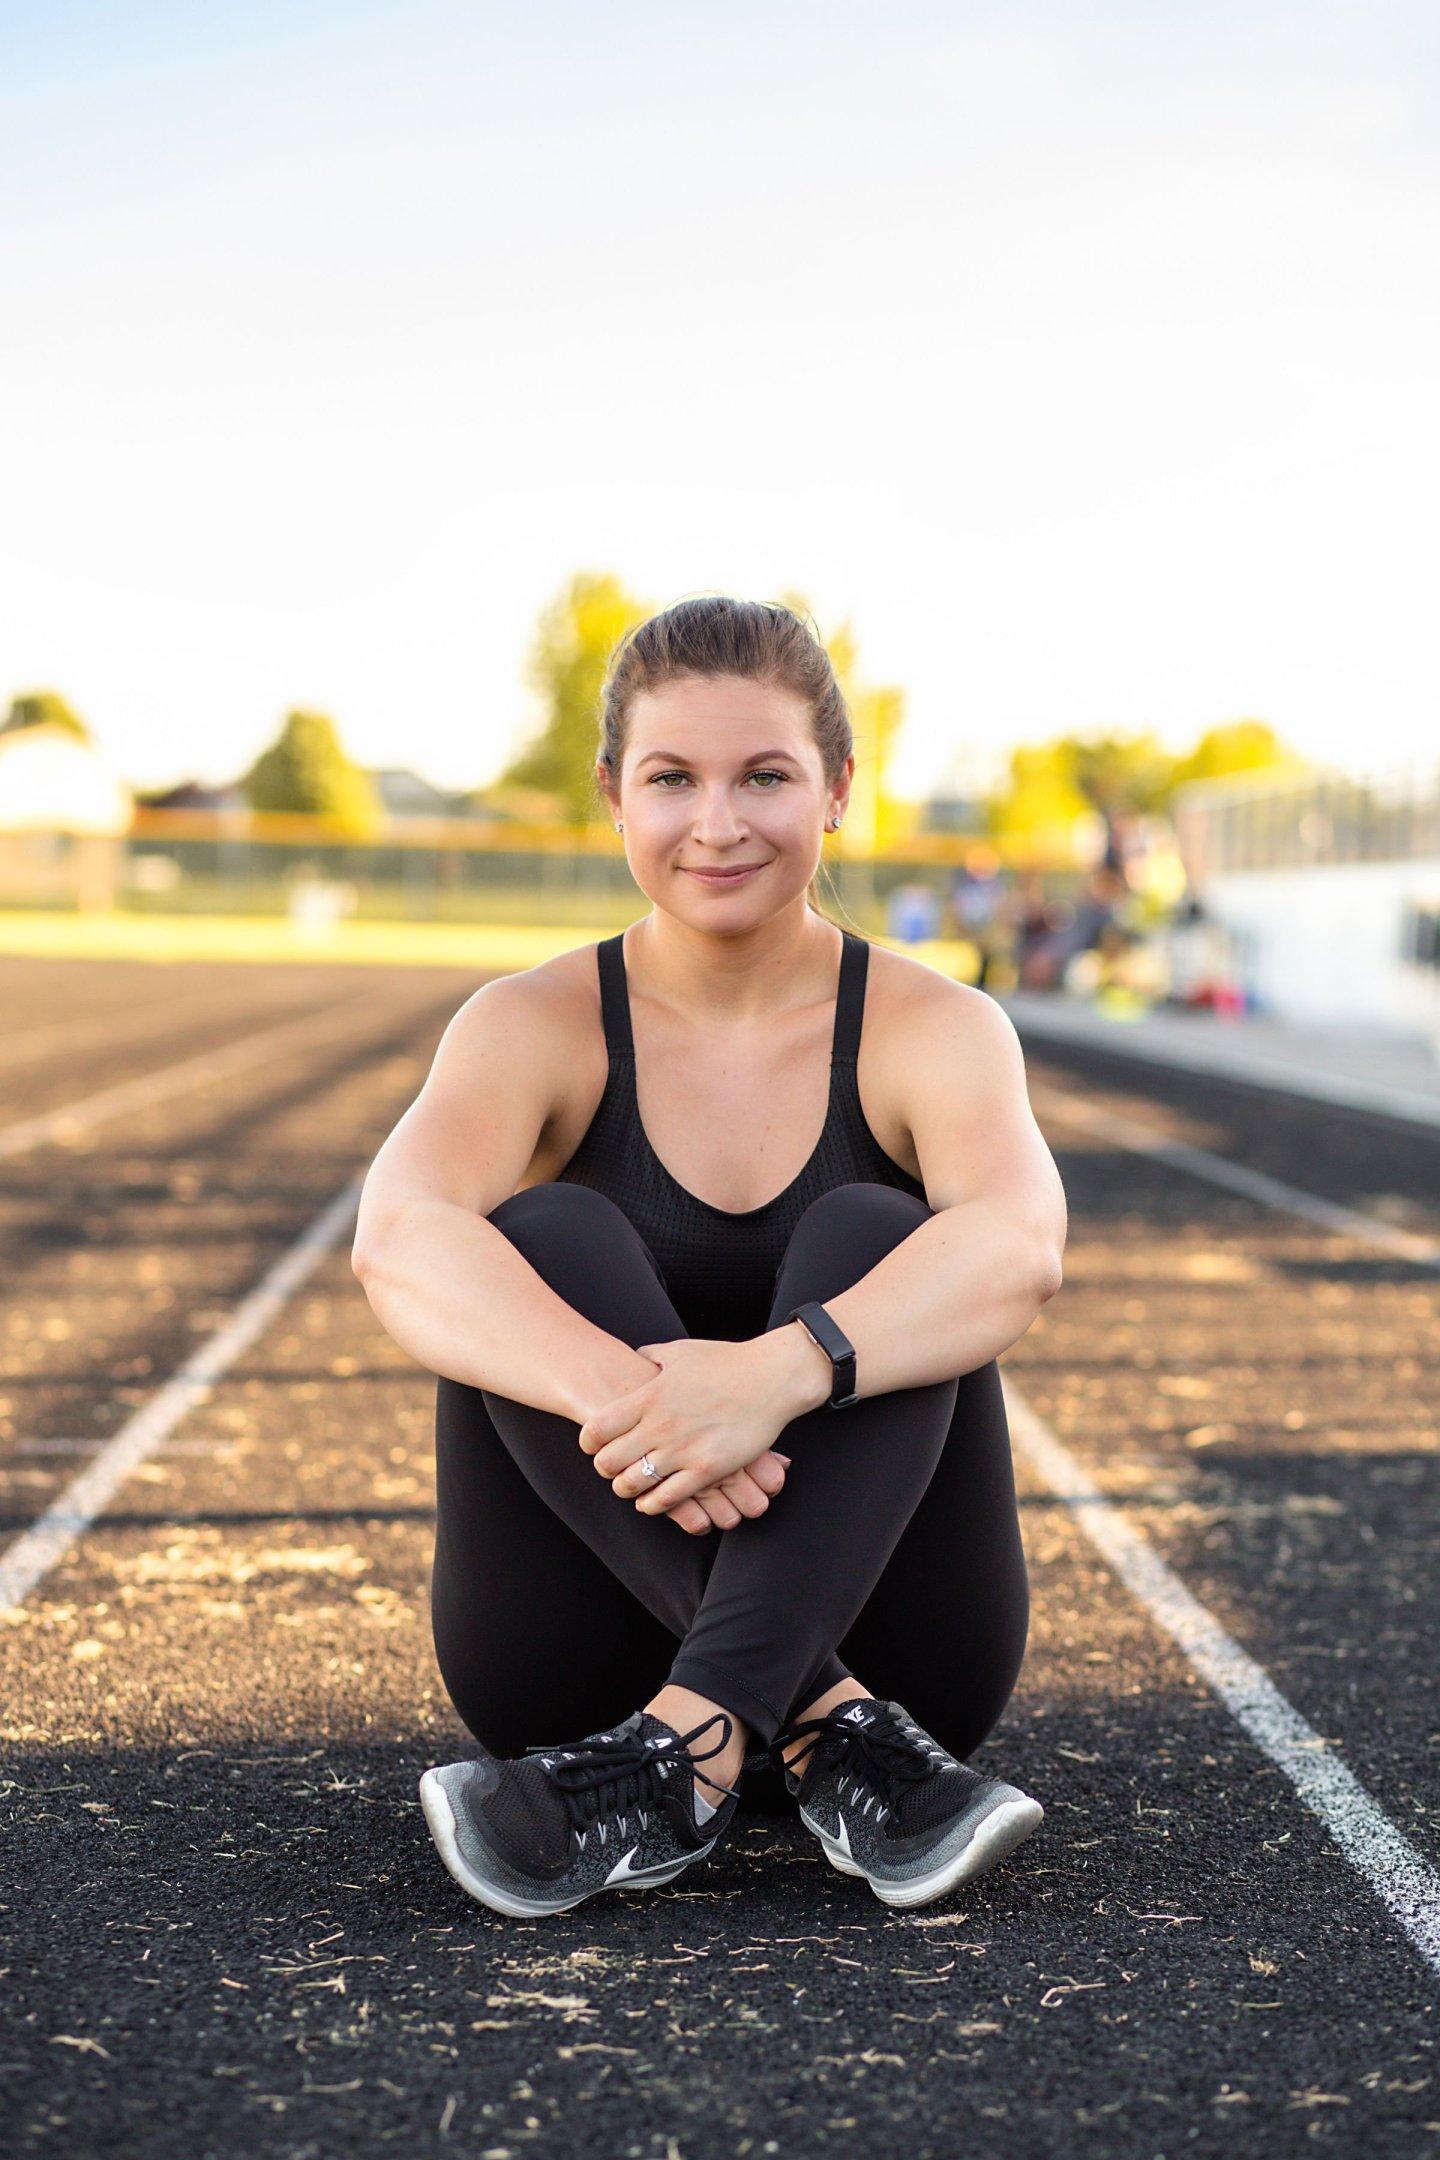 Hayle sitting on a track cross-legged